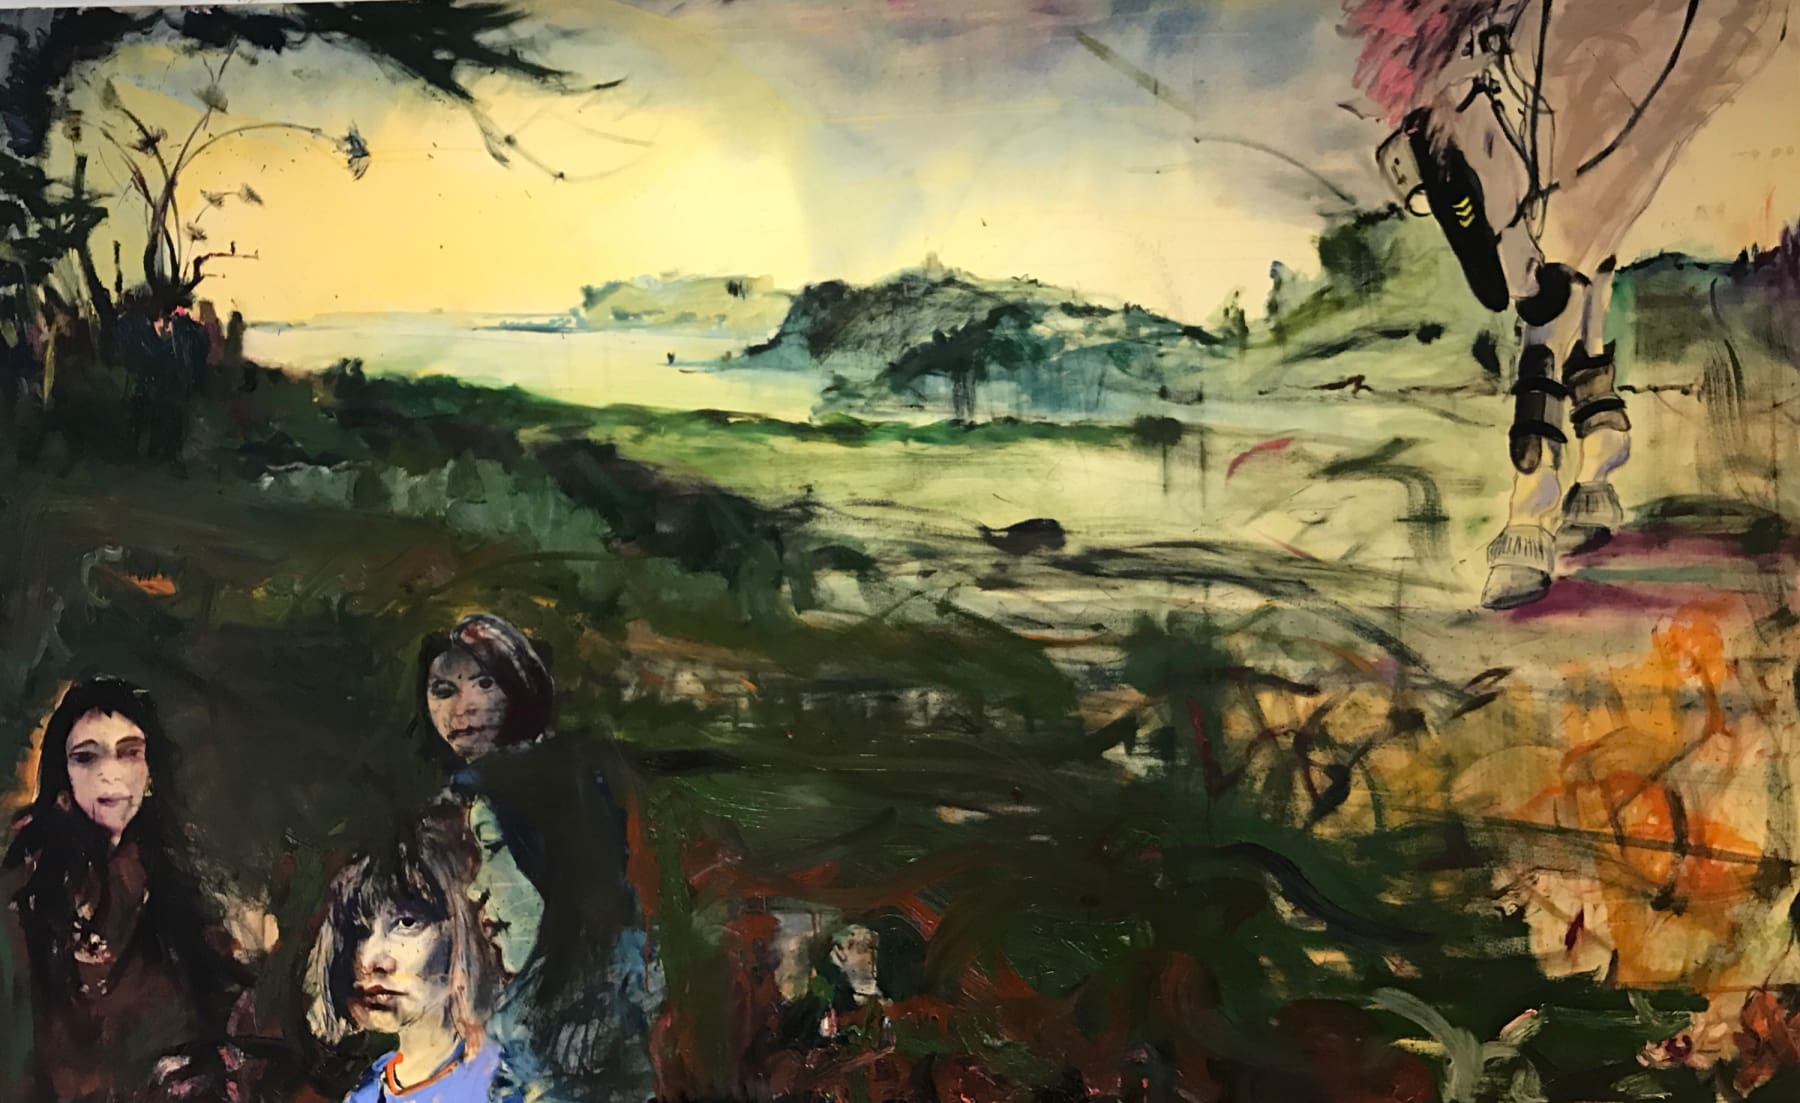 Blair McLaughlin, Kindred Spirits, 2017